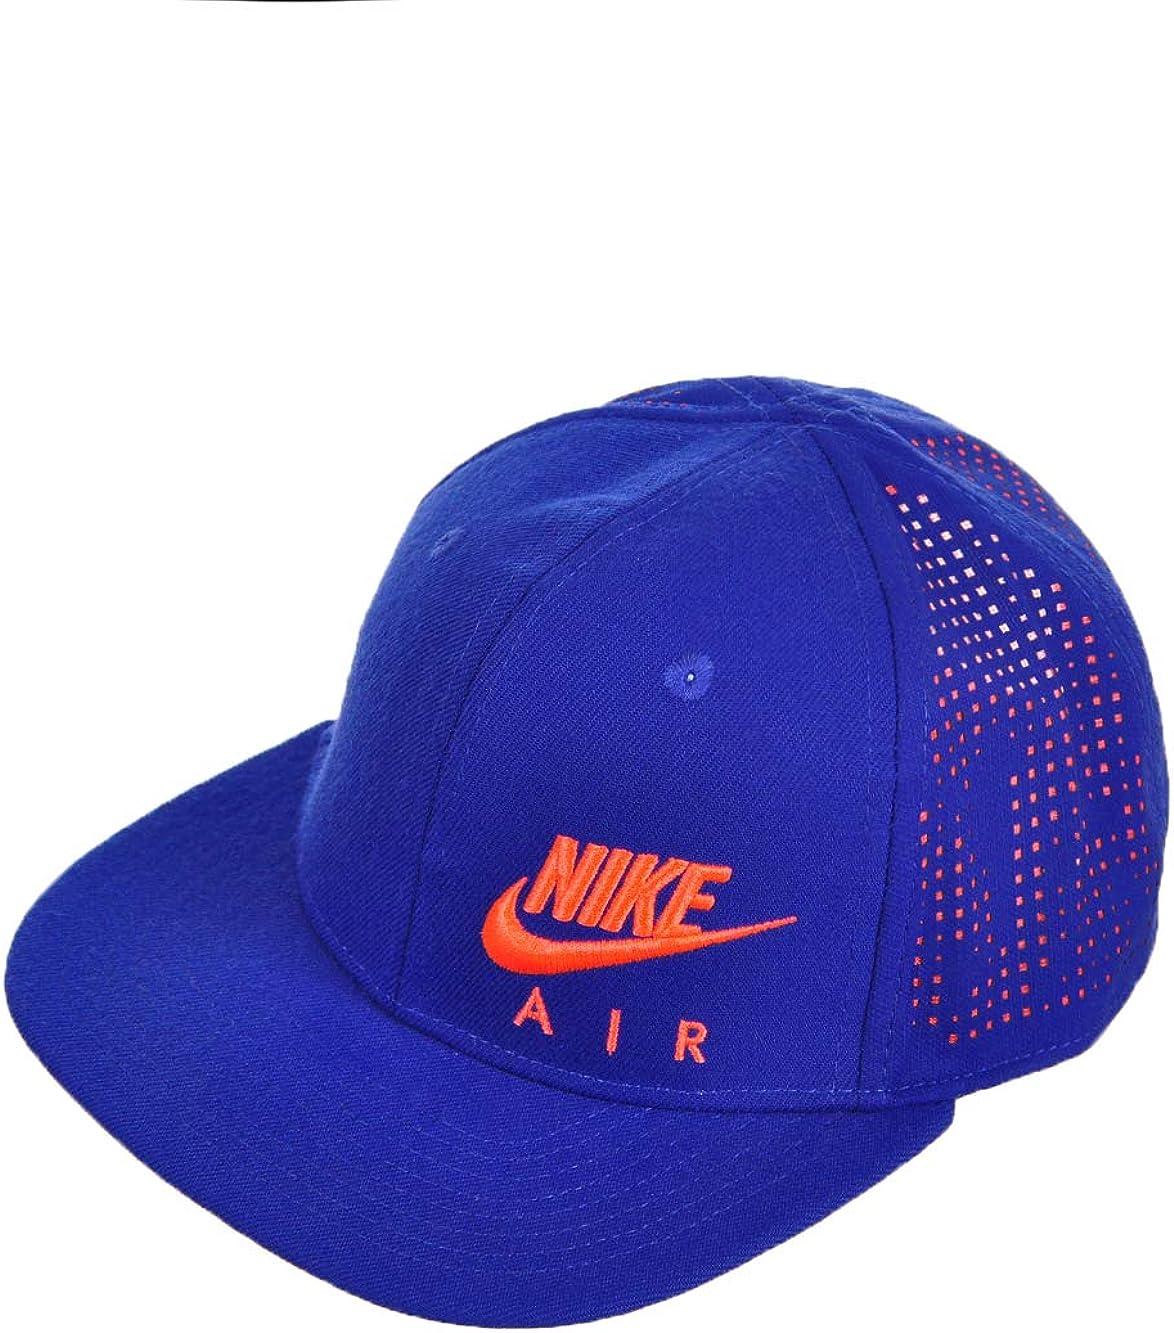 Parlamento Censo nacional Solicitud  Amazon.com: Nike Air Boy's Hybrid True Snapback Mesh Back Hat Cap Headwear  Royal Blue: Clothing